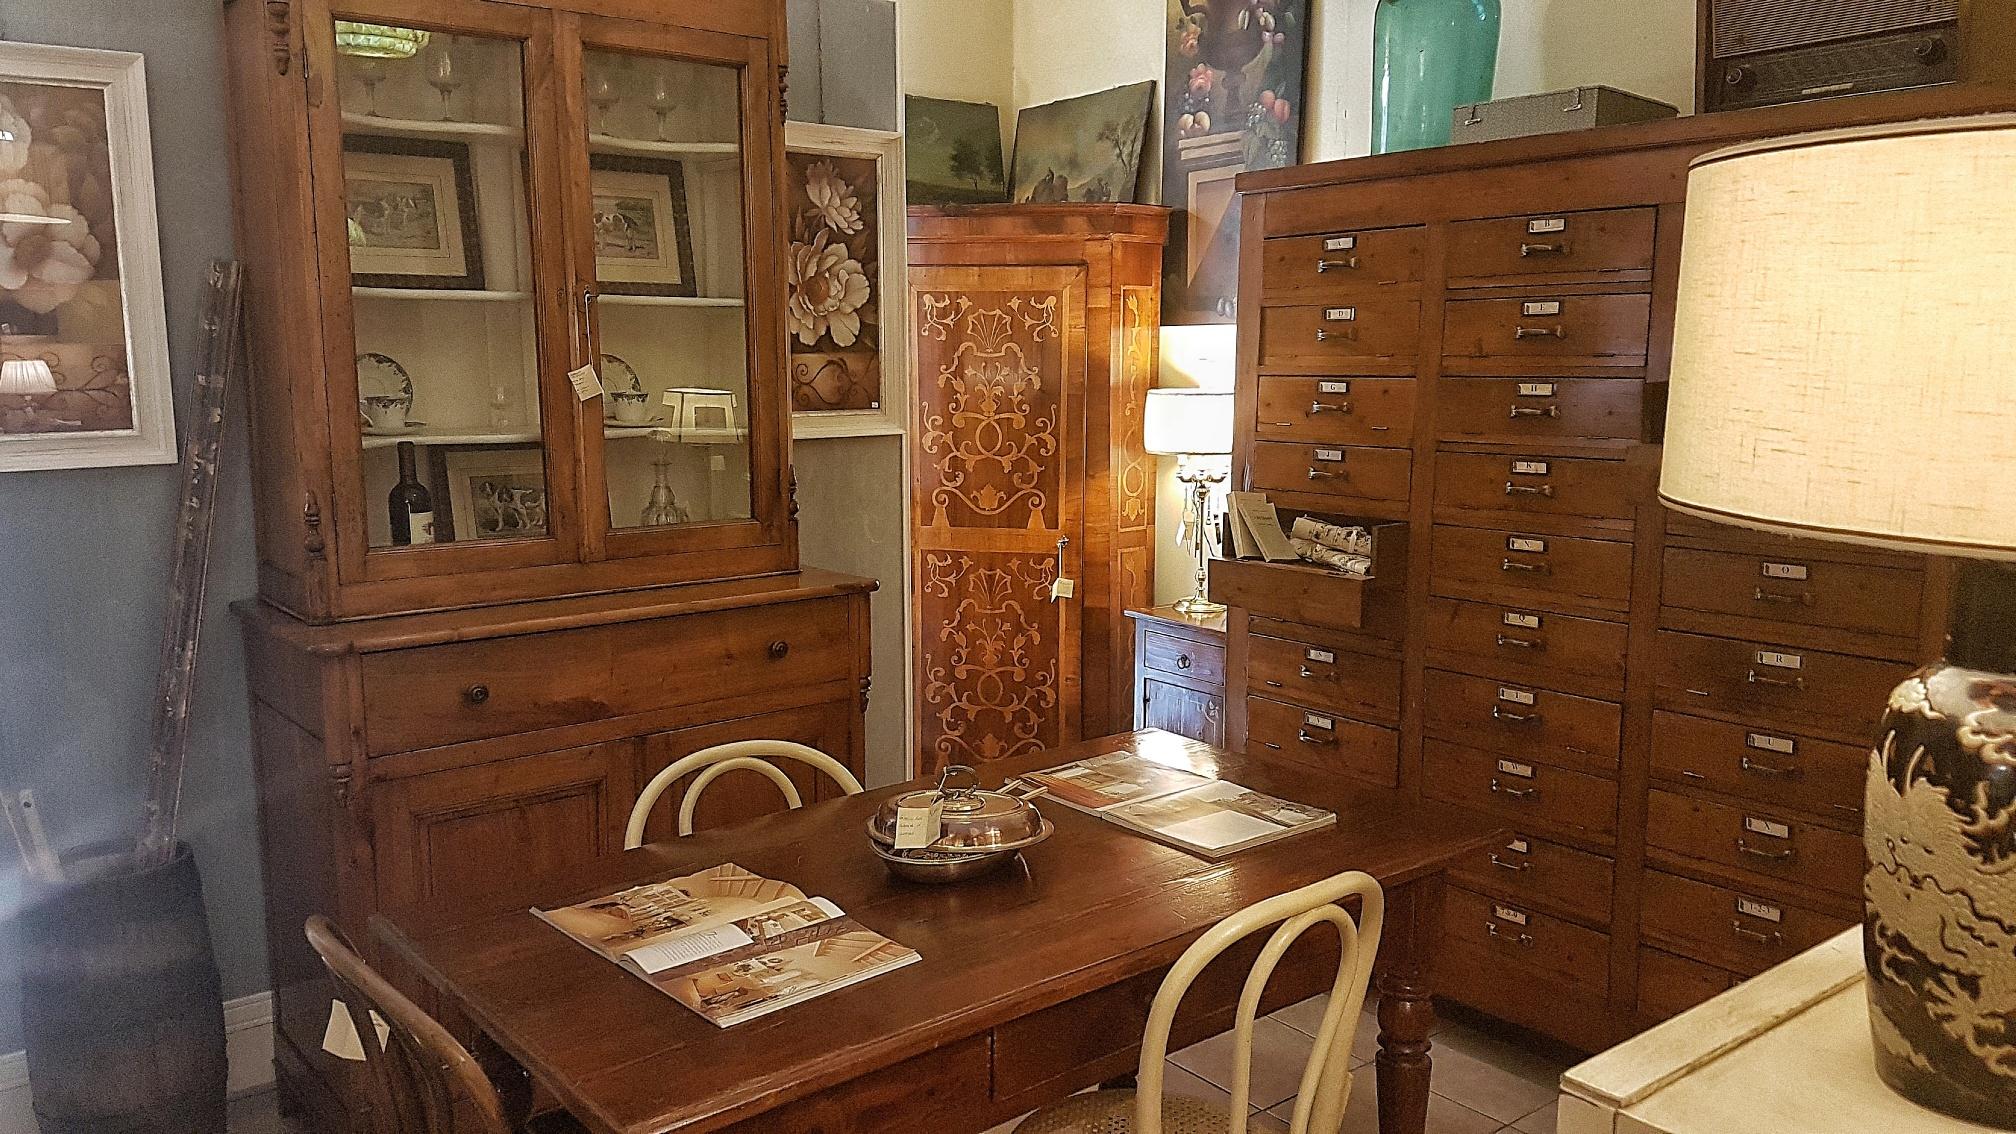 Credenza Rustica Toscana : Arredamento contemporaneo mobili country su misura siena u2013 firenze